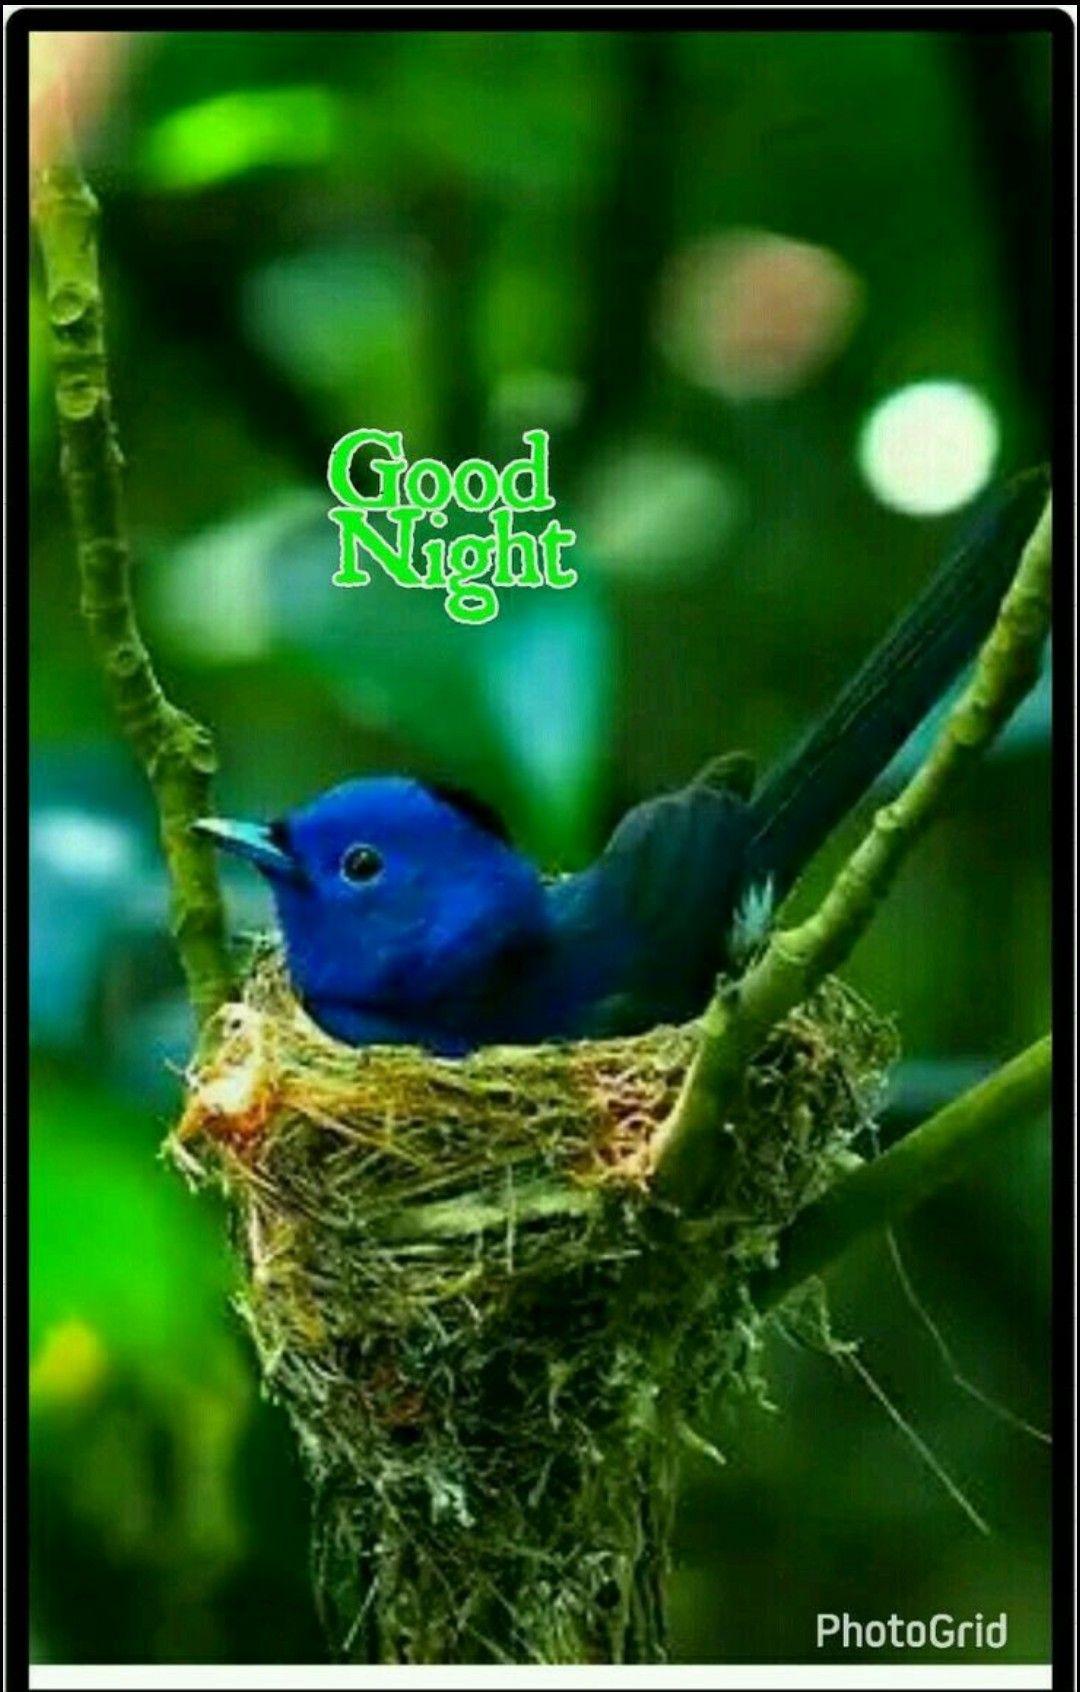 Pin By Sally Bacchus On Sweet Slumber Birds Pet Birds Beautiful